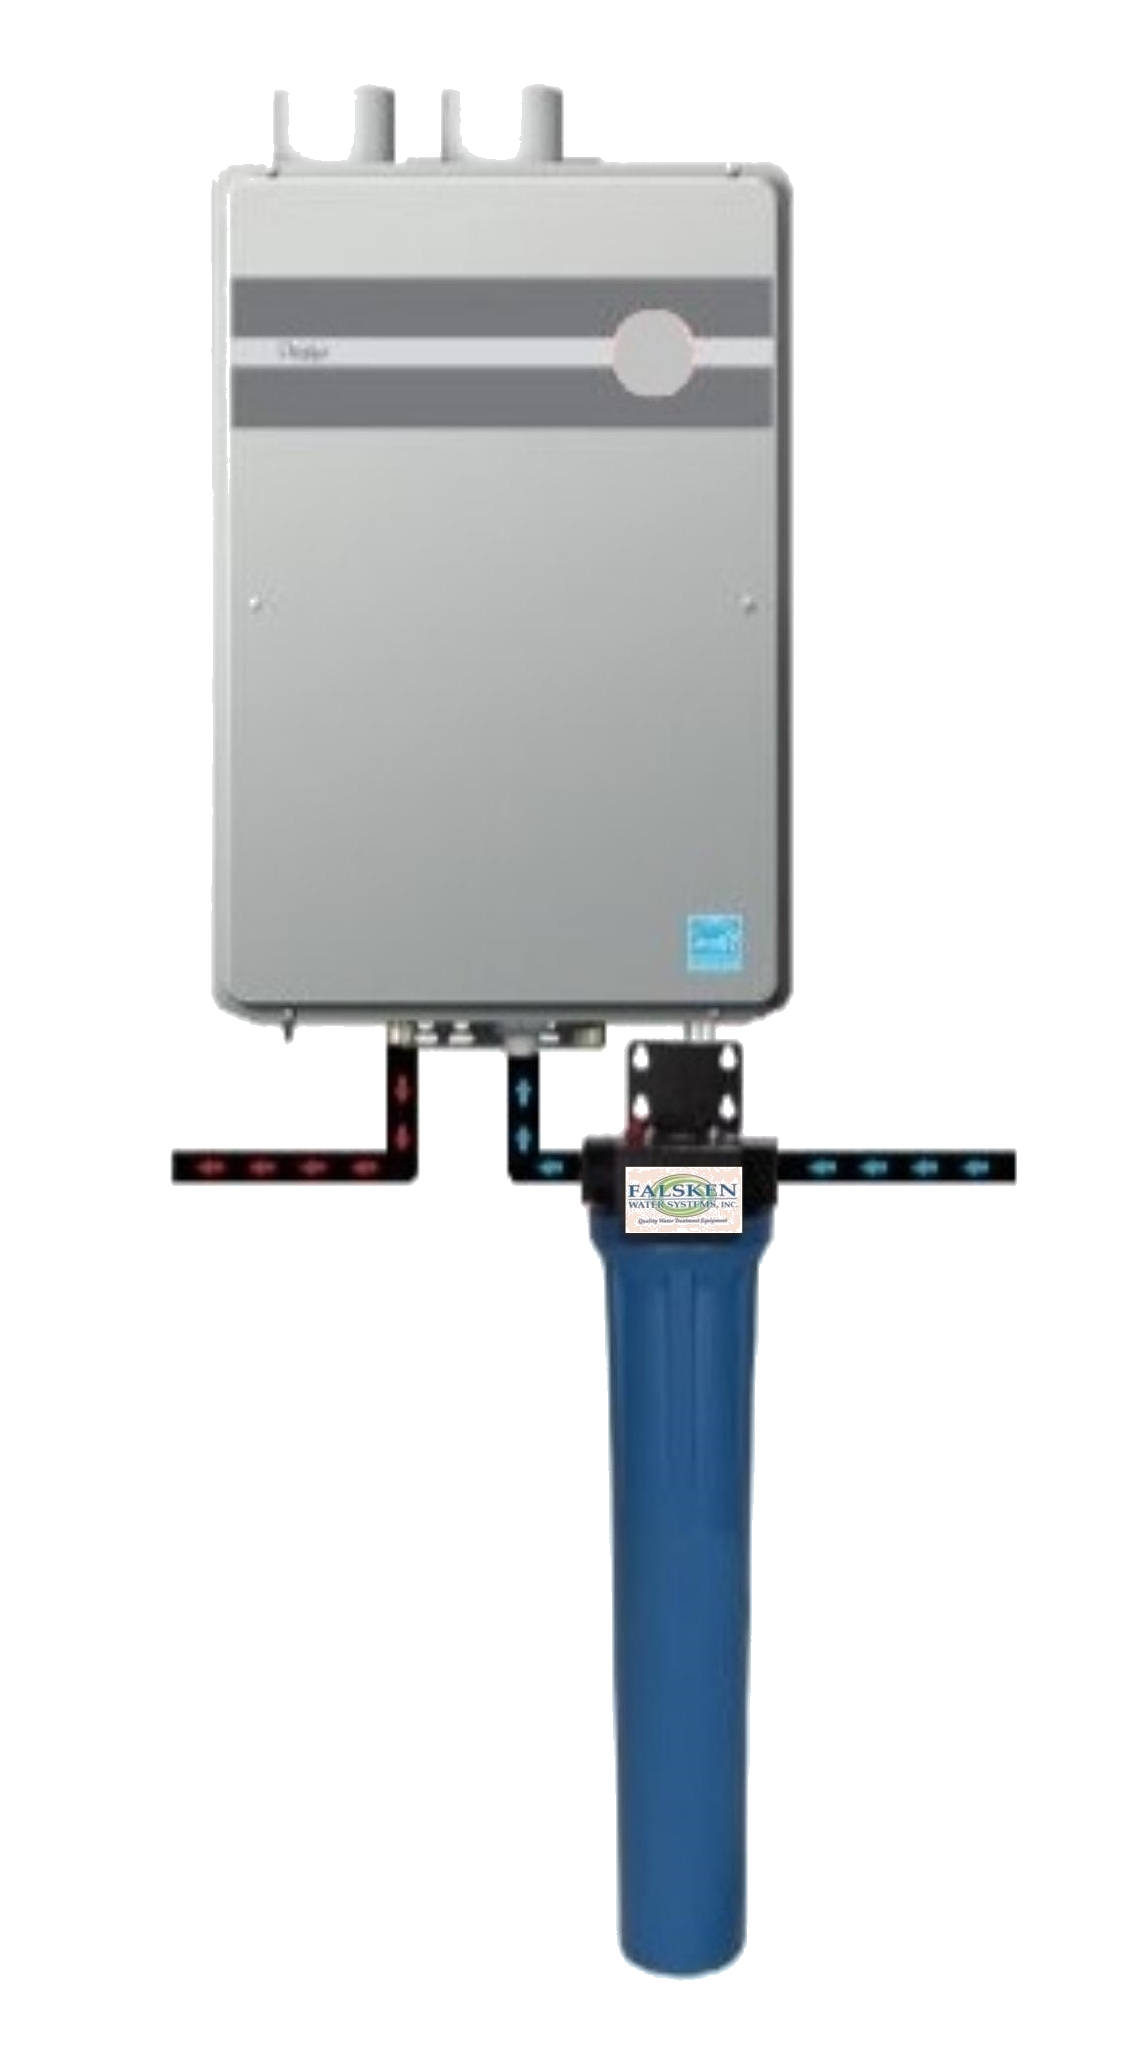 ftht install diagram with FWS bracket label